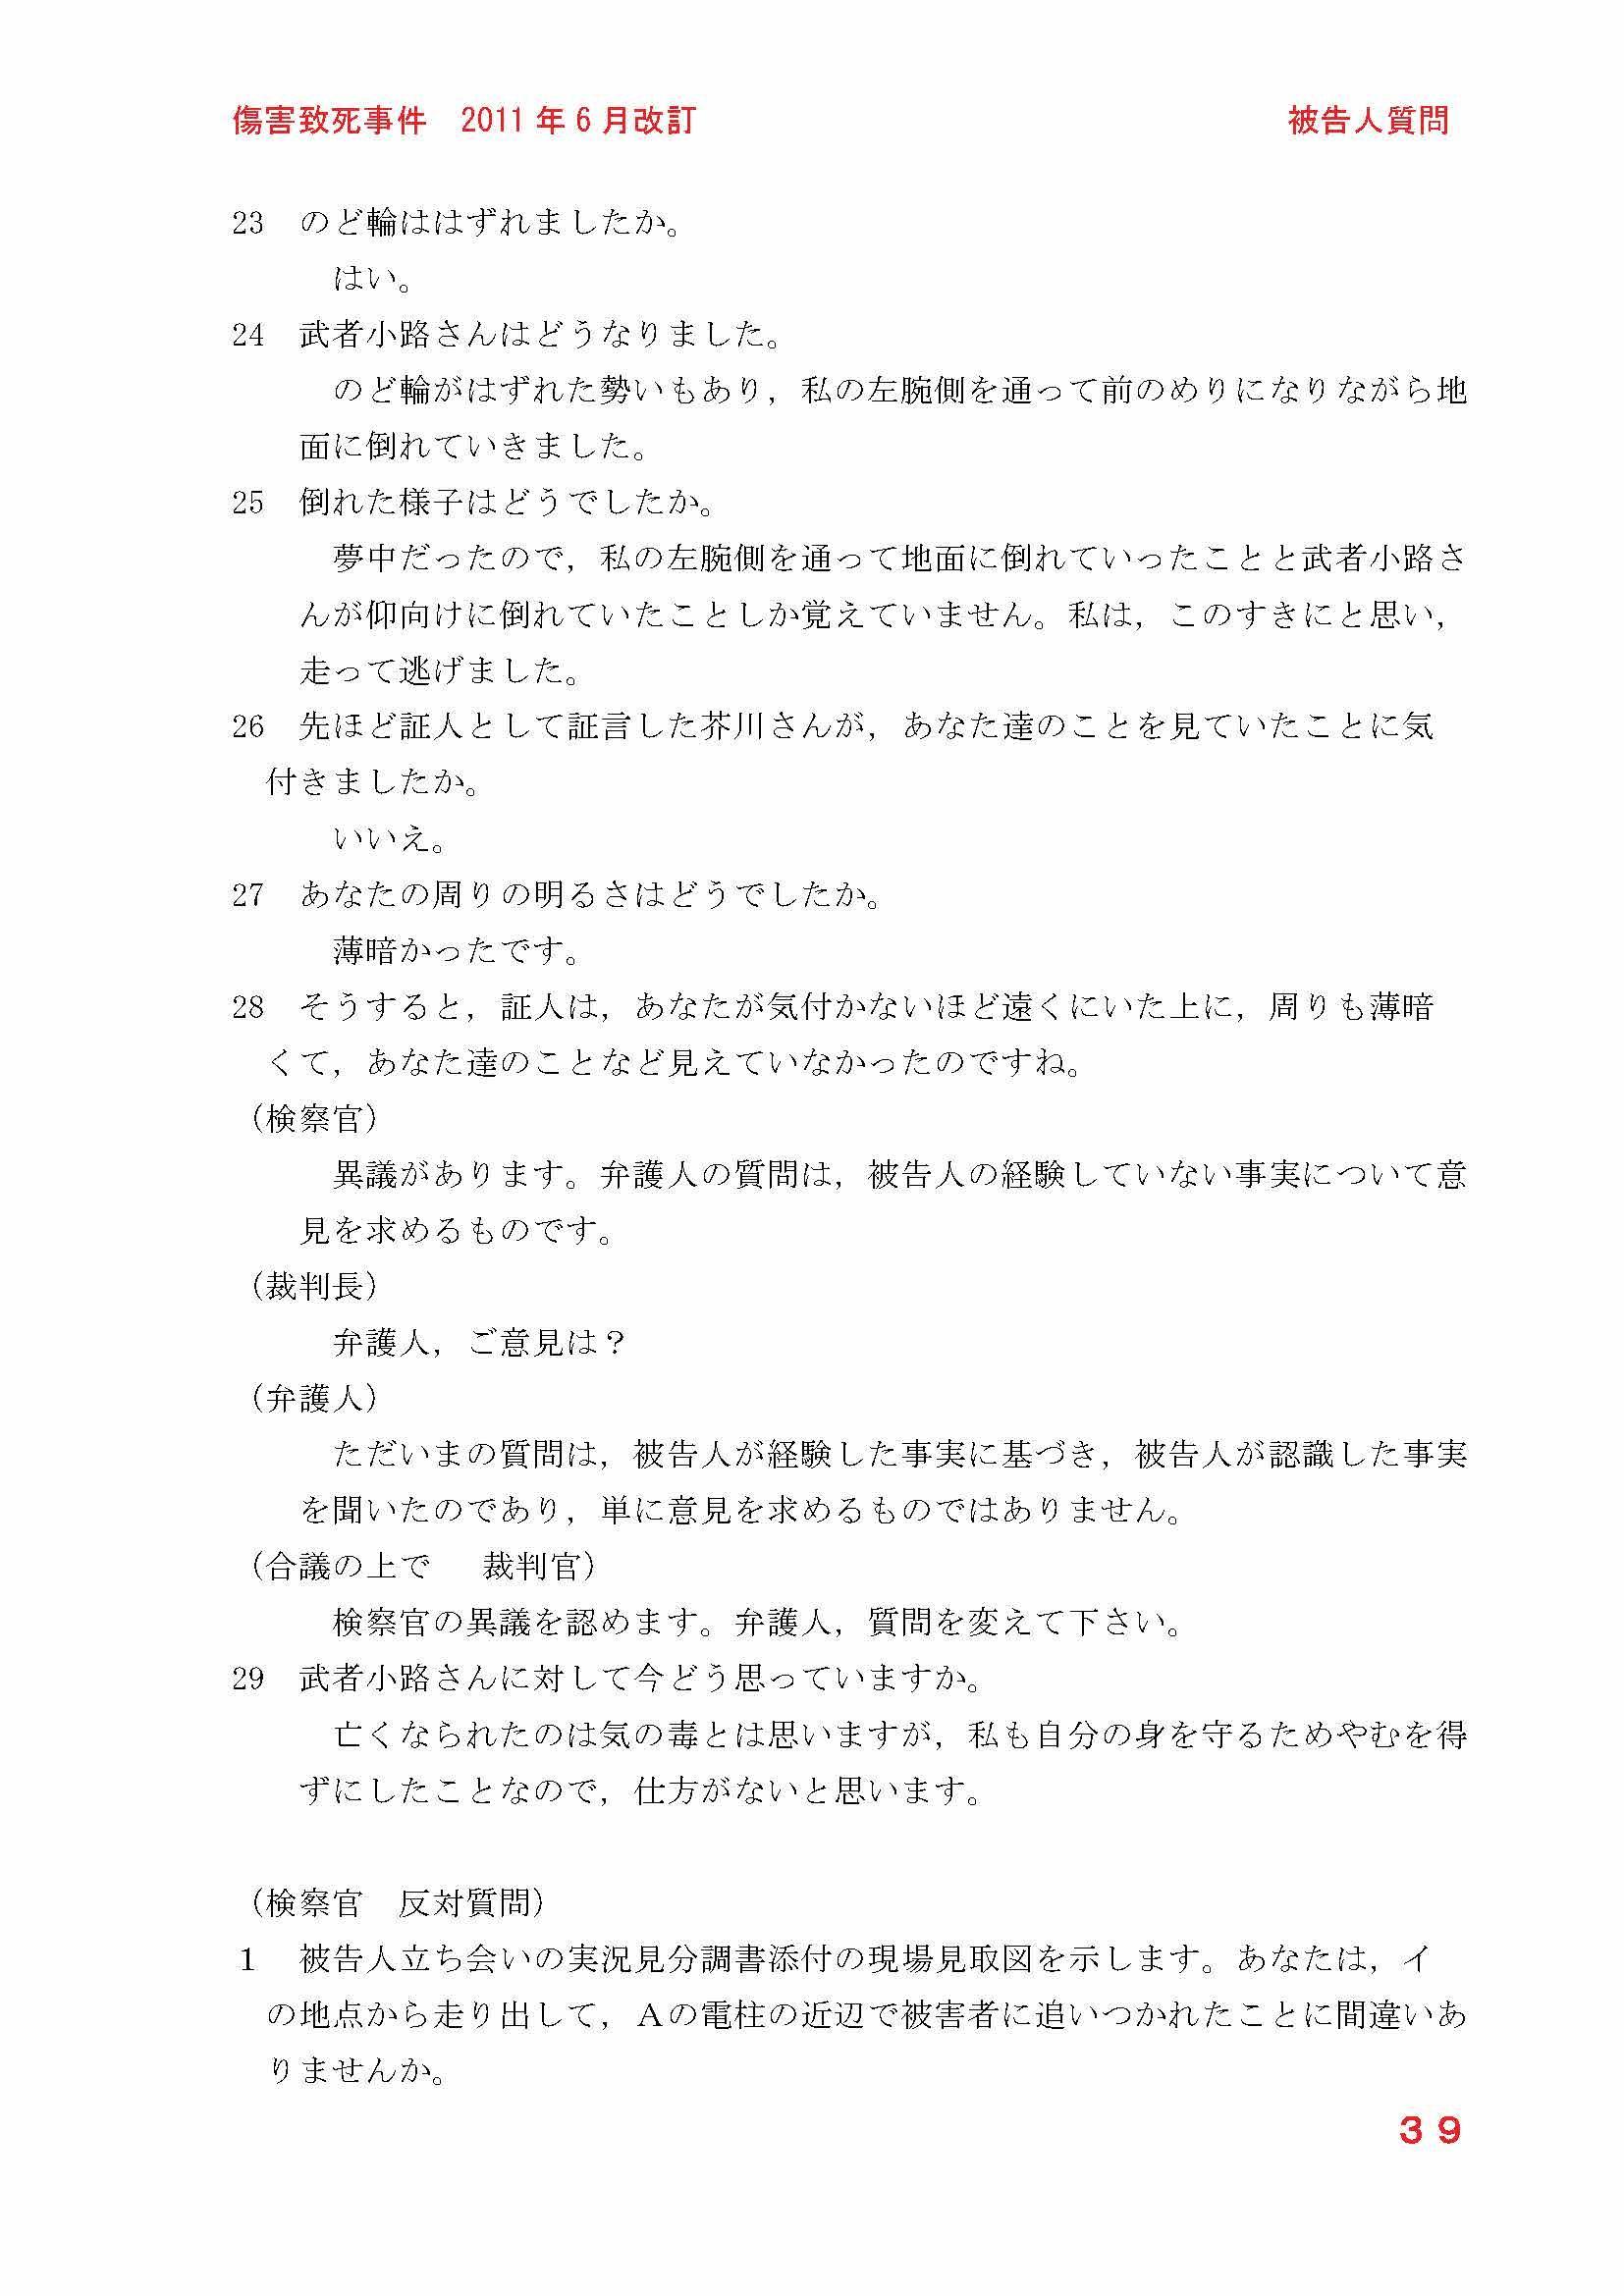 shogaichishi5.jpg